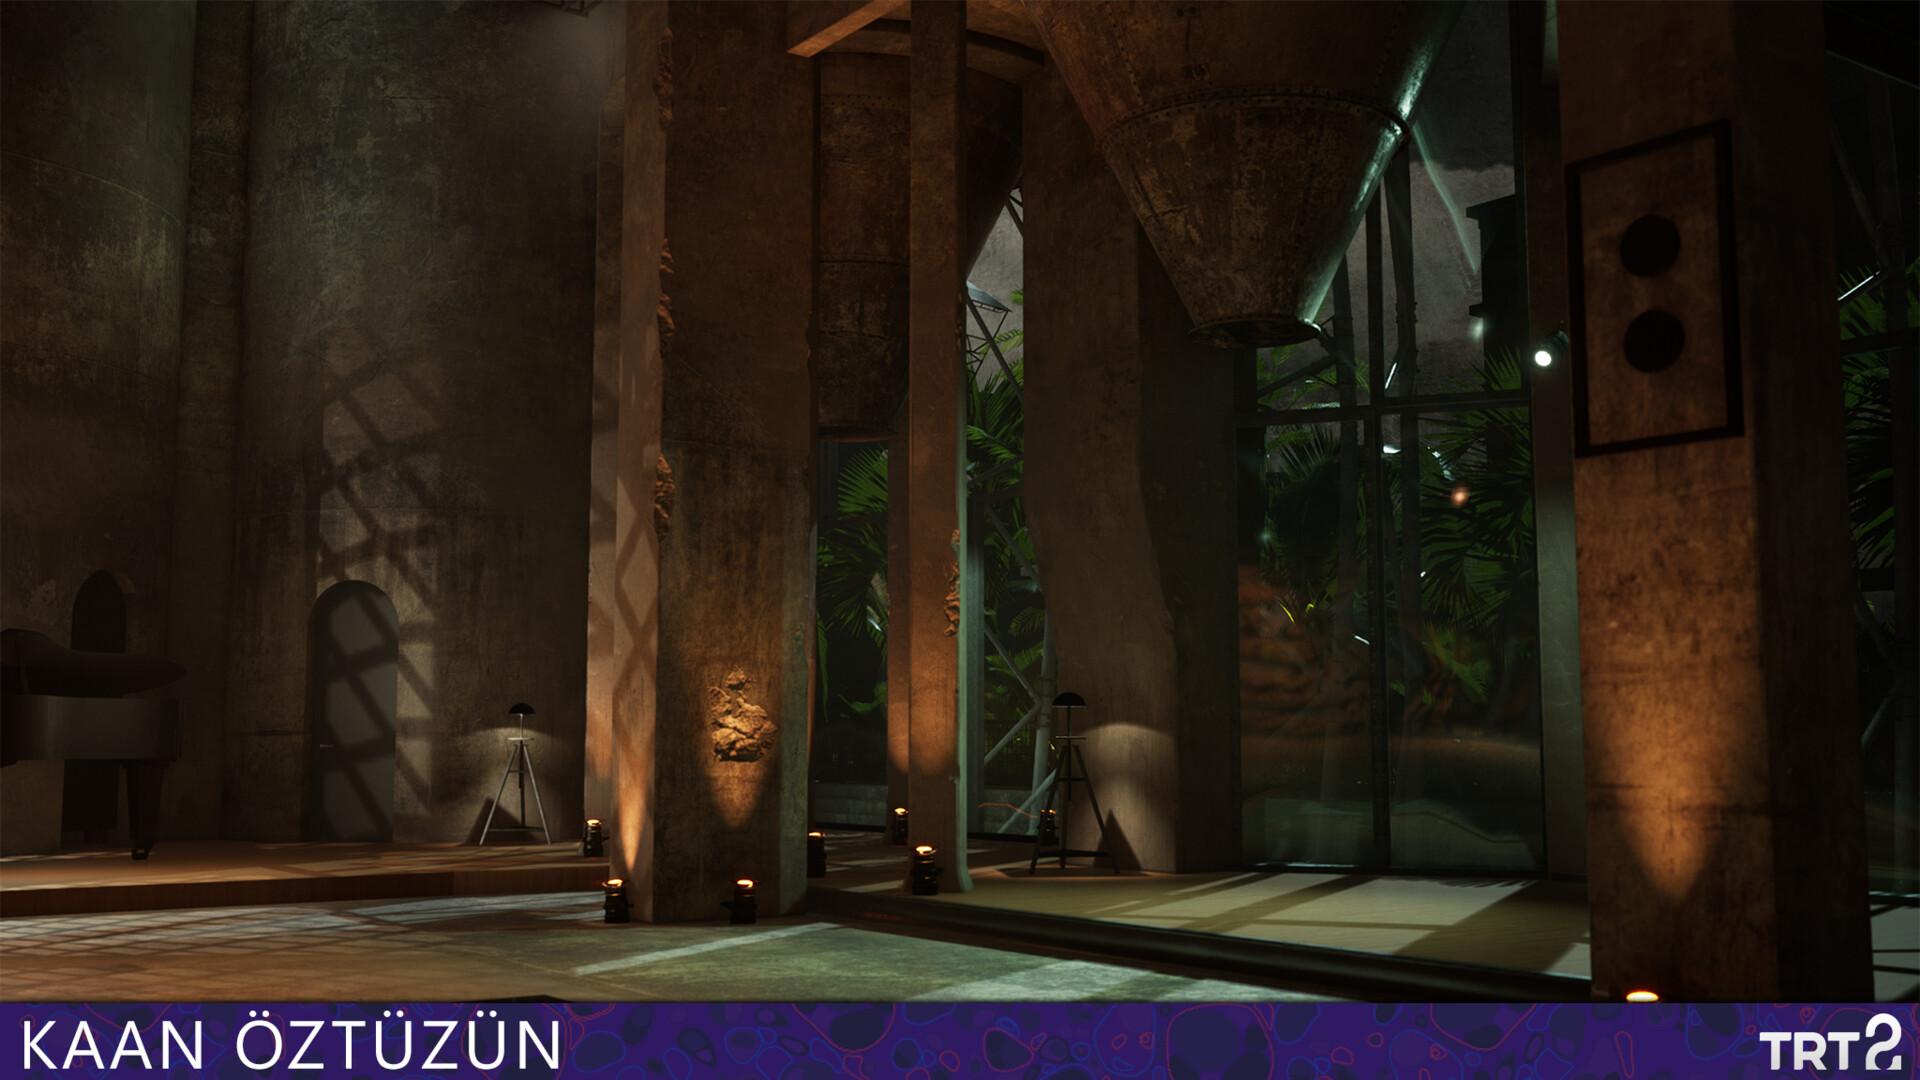 kaan-oztuzun-trt2-factory-kaanoztuzun-04-artstation.jpg